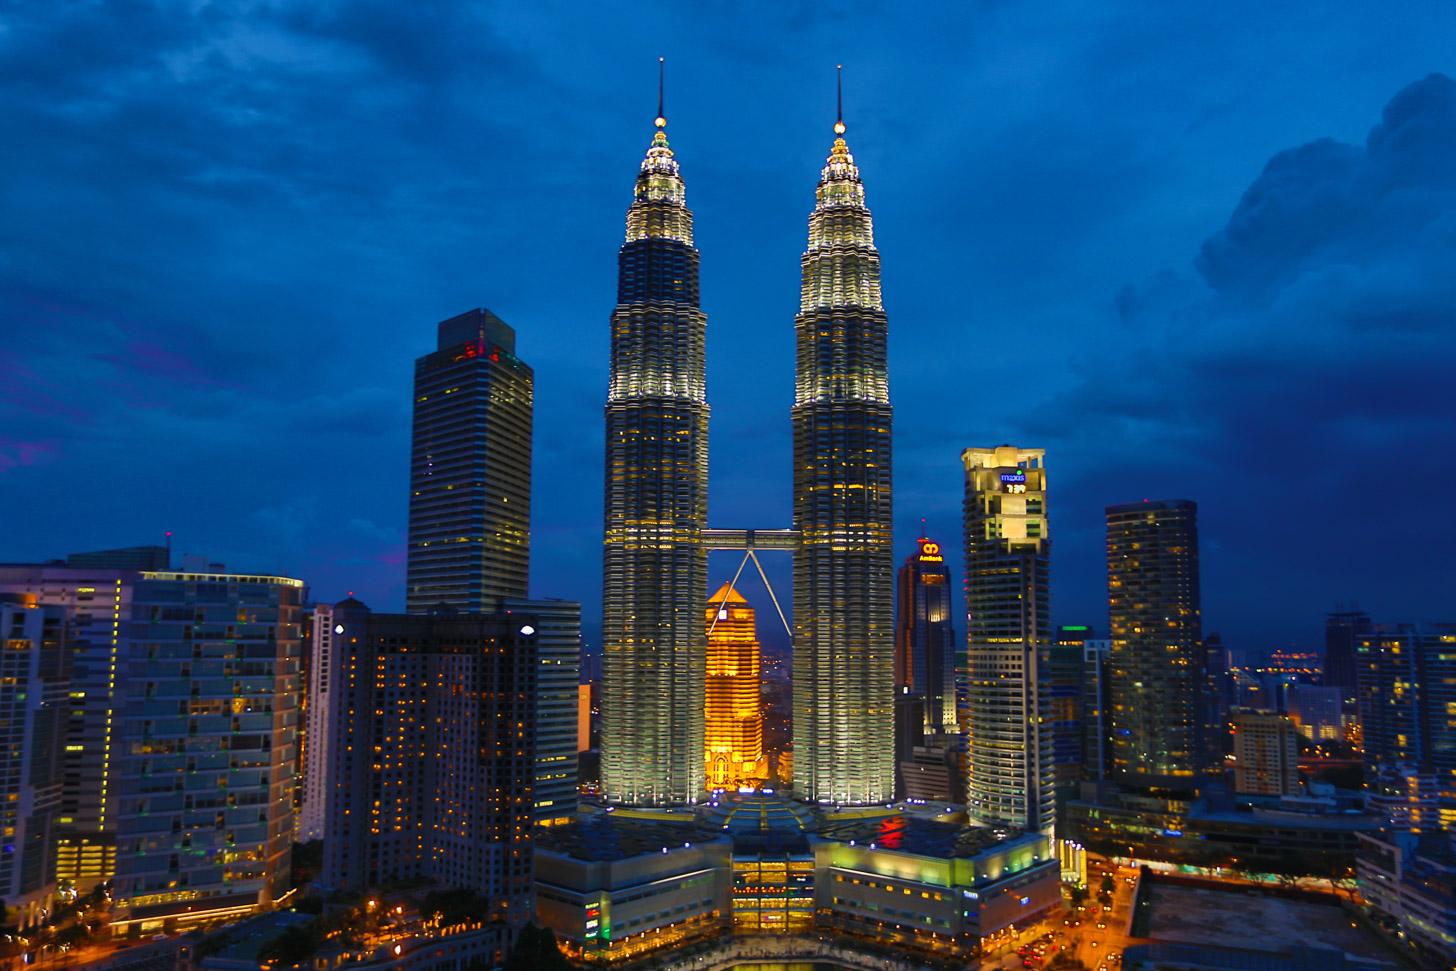 Modern Kuala Lumpur met de Petronas Twin Towers